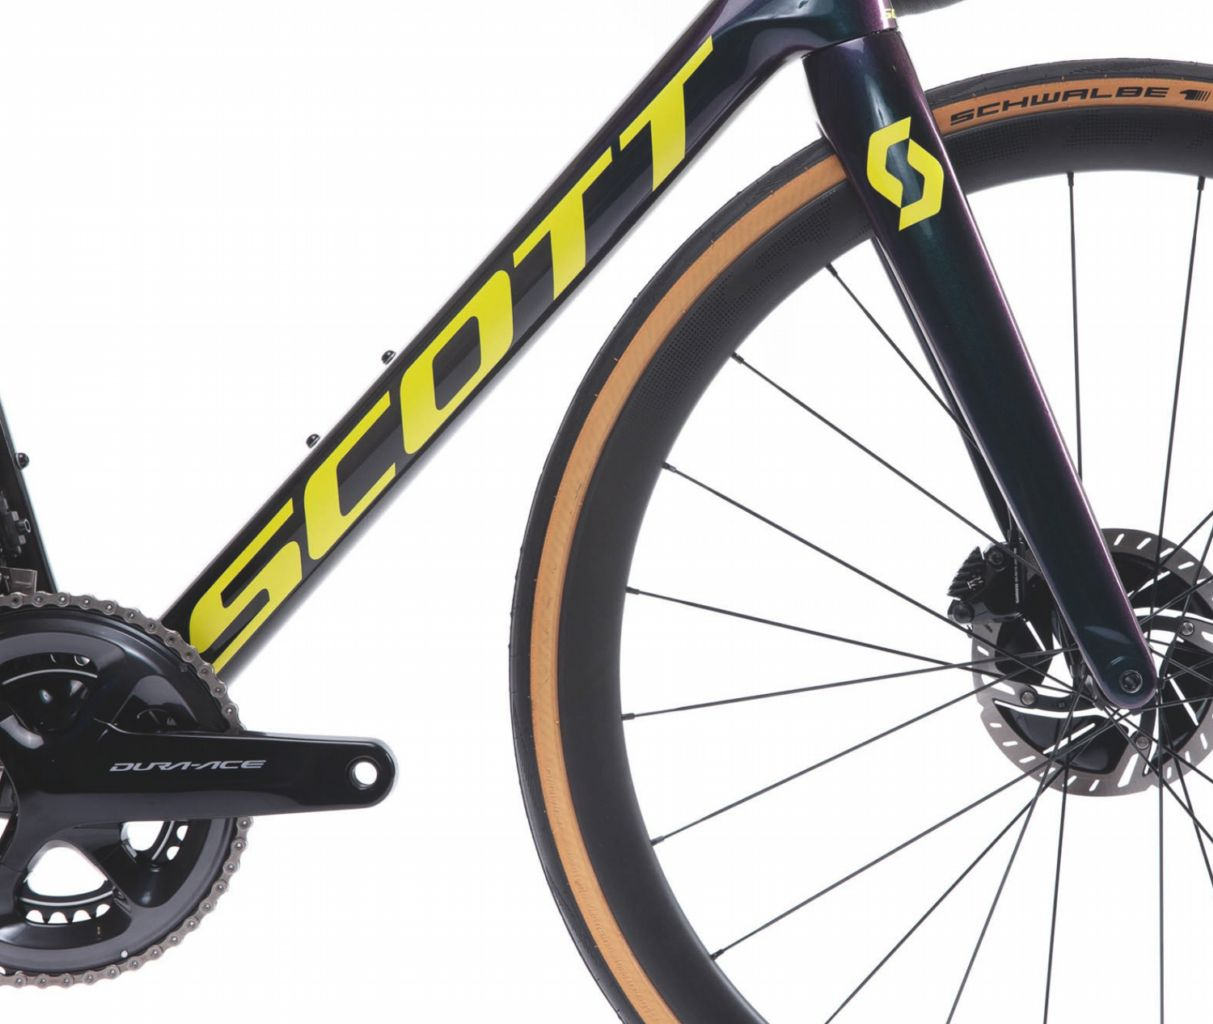 Bici strada Bicicletta Scott Addict RC Pro